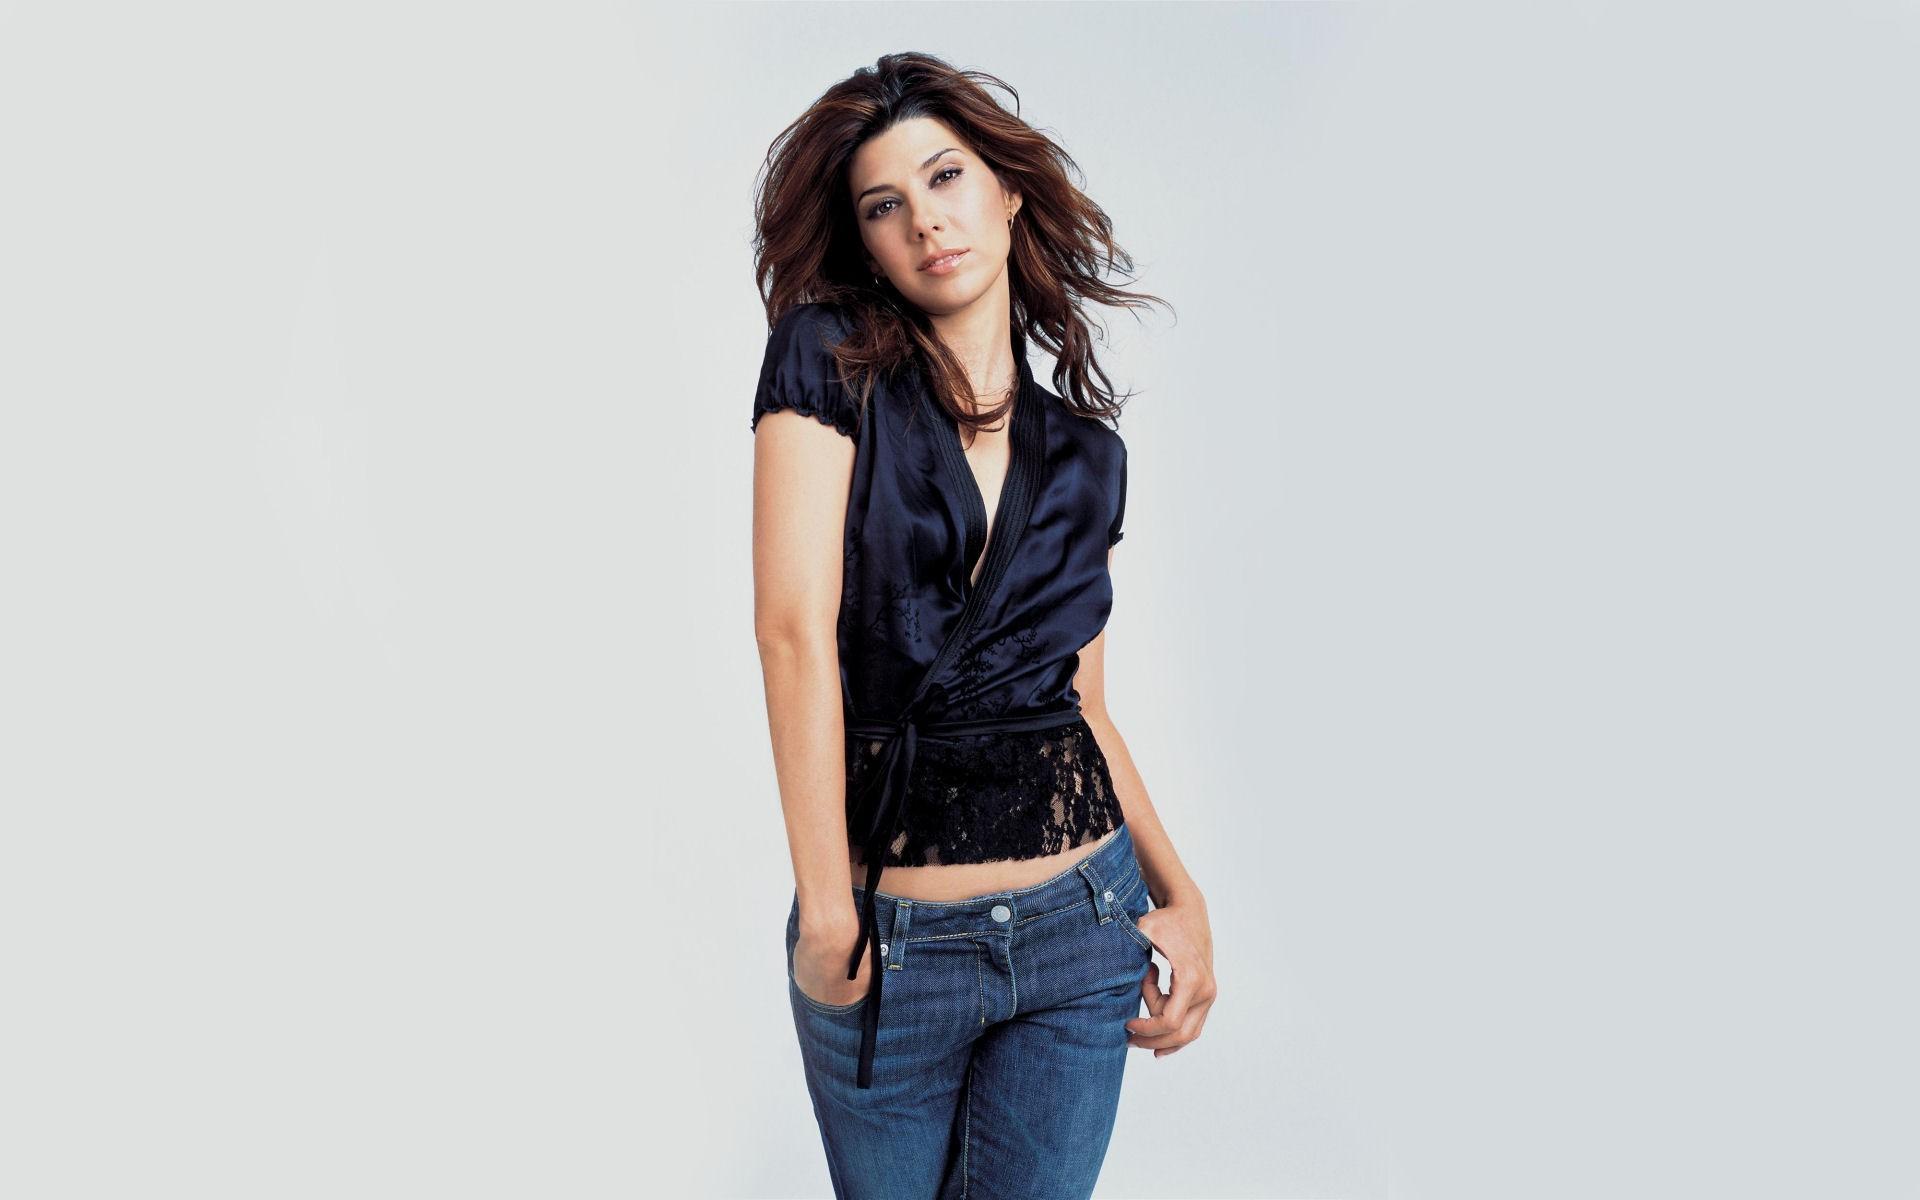 10 Hd Marisa Tomei Wallpapers-6002